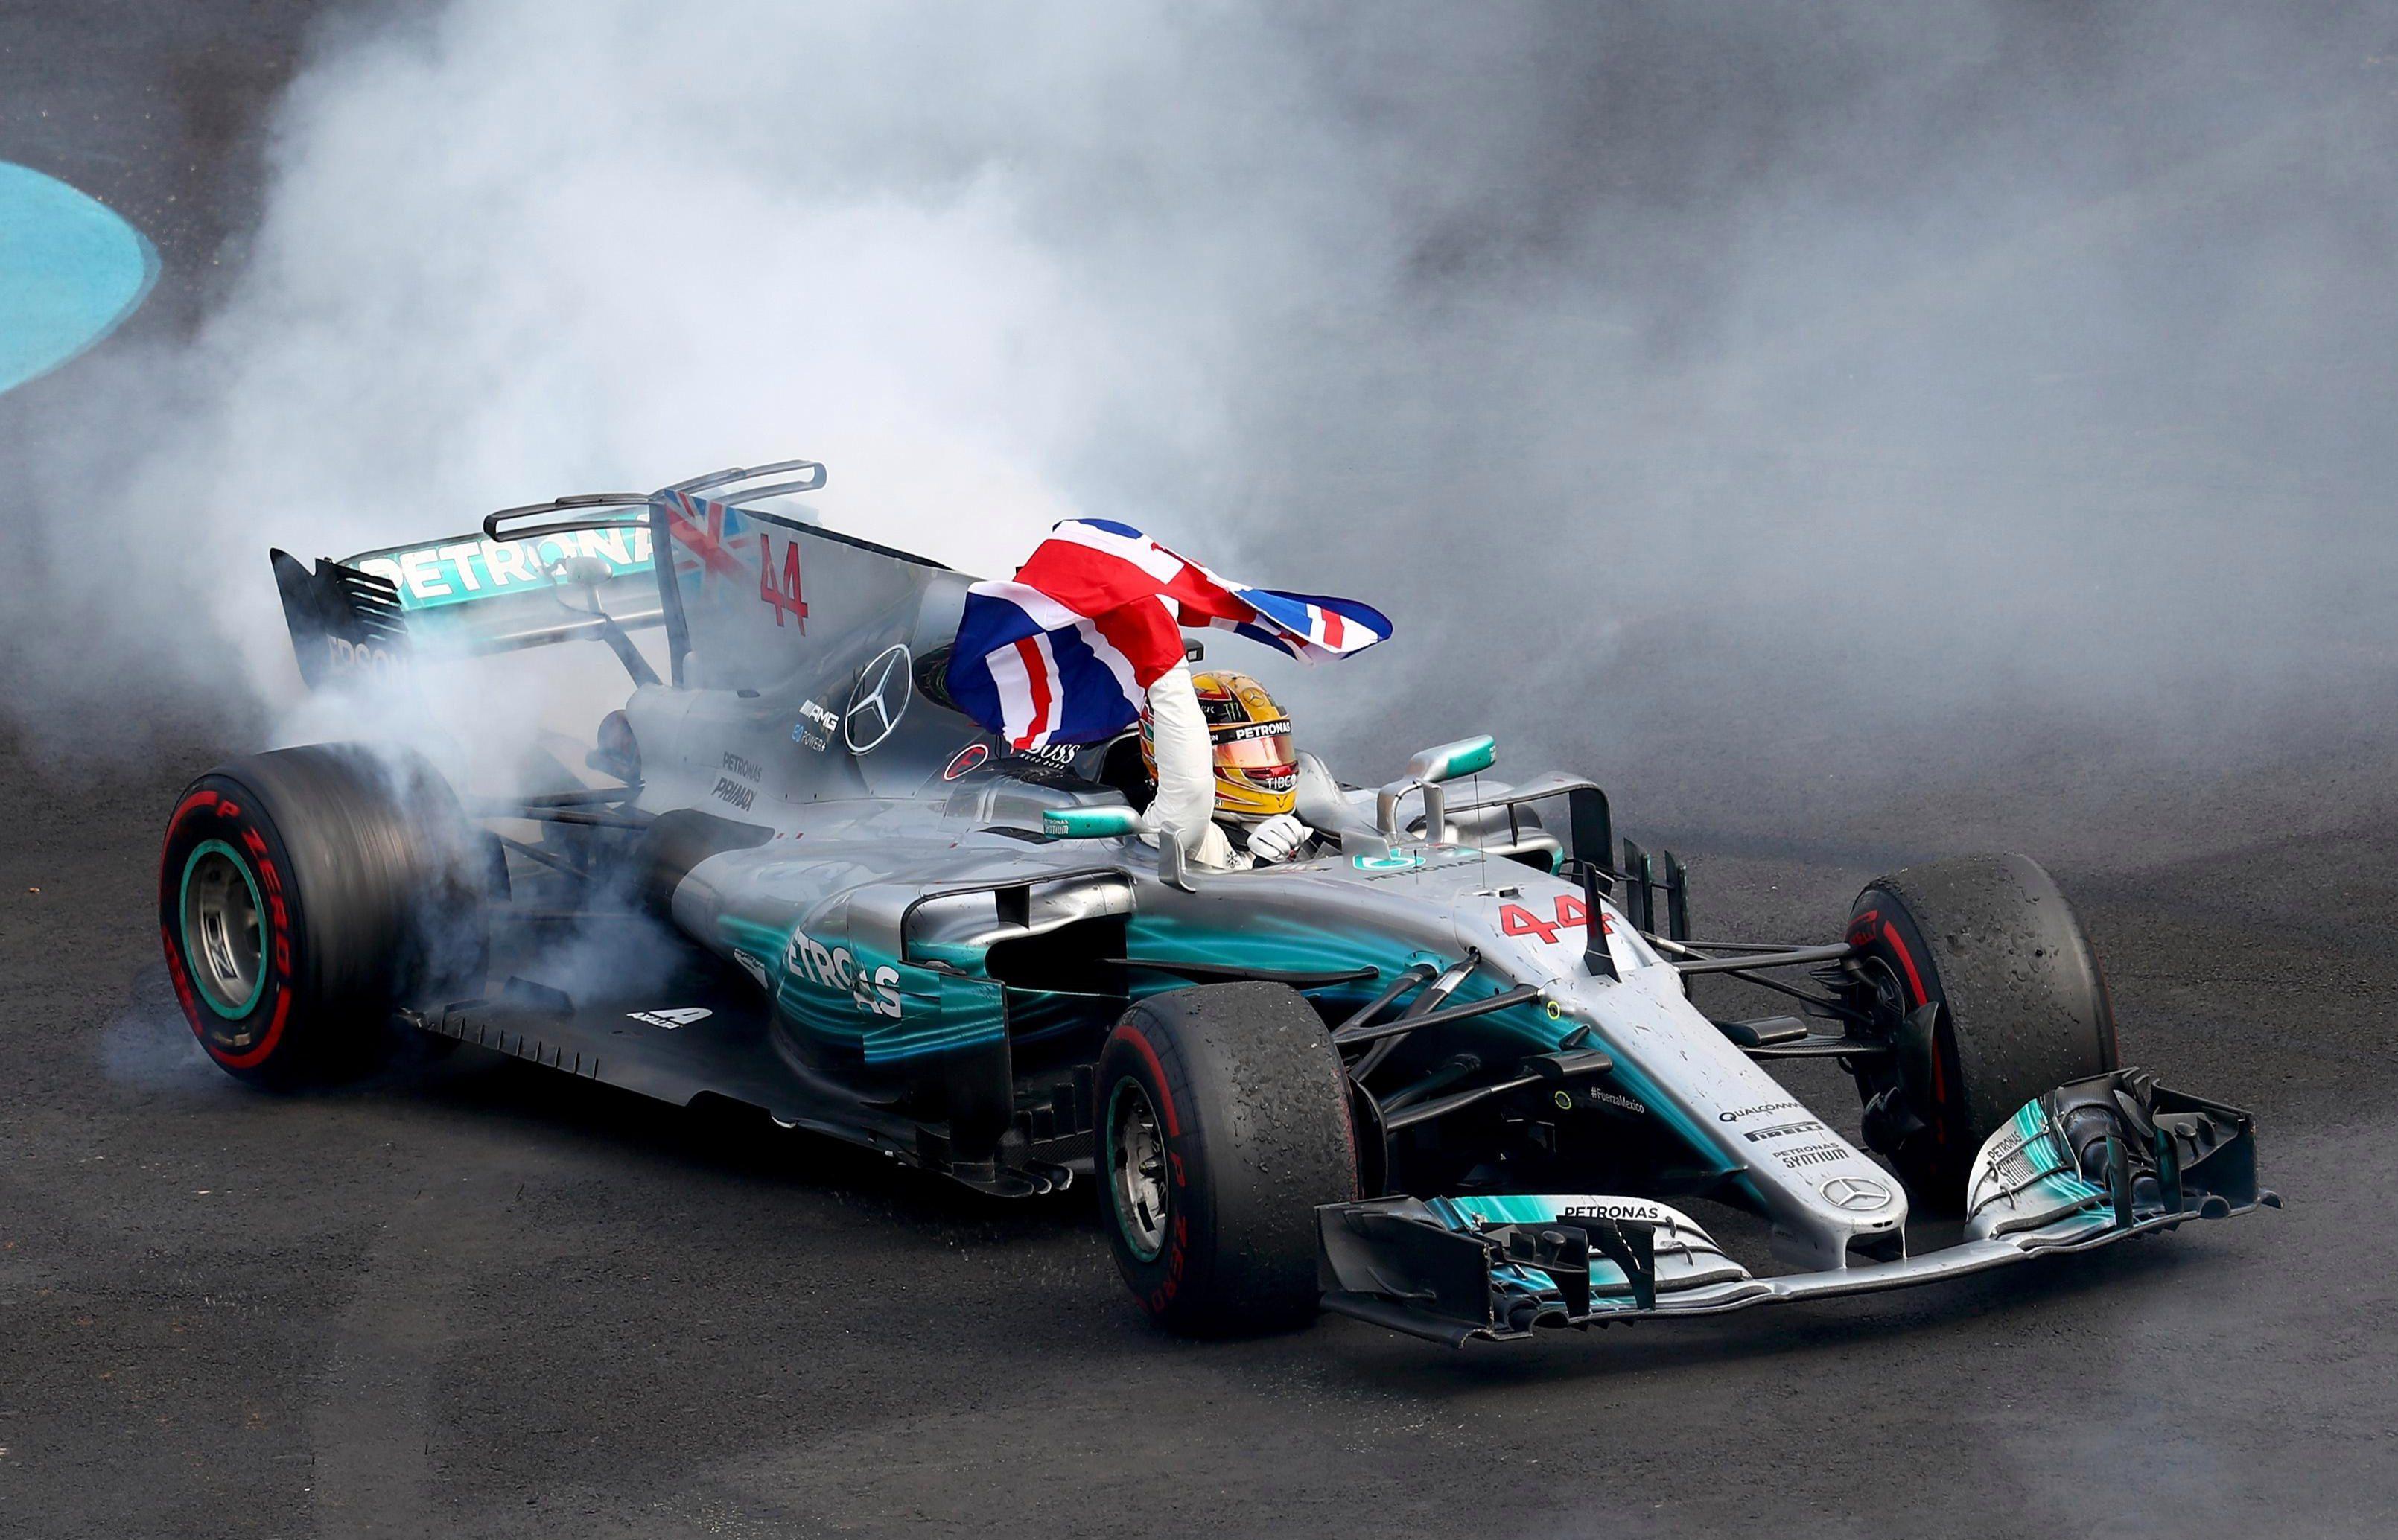 Hamilton did his trademark donuts after sealing victory